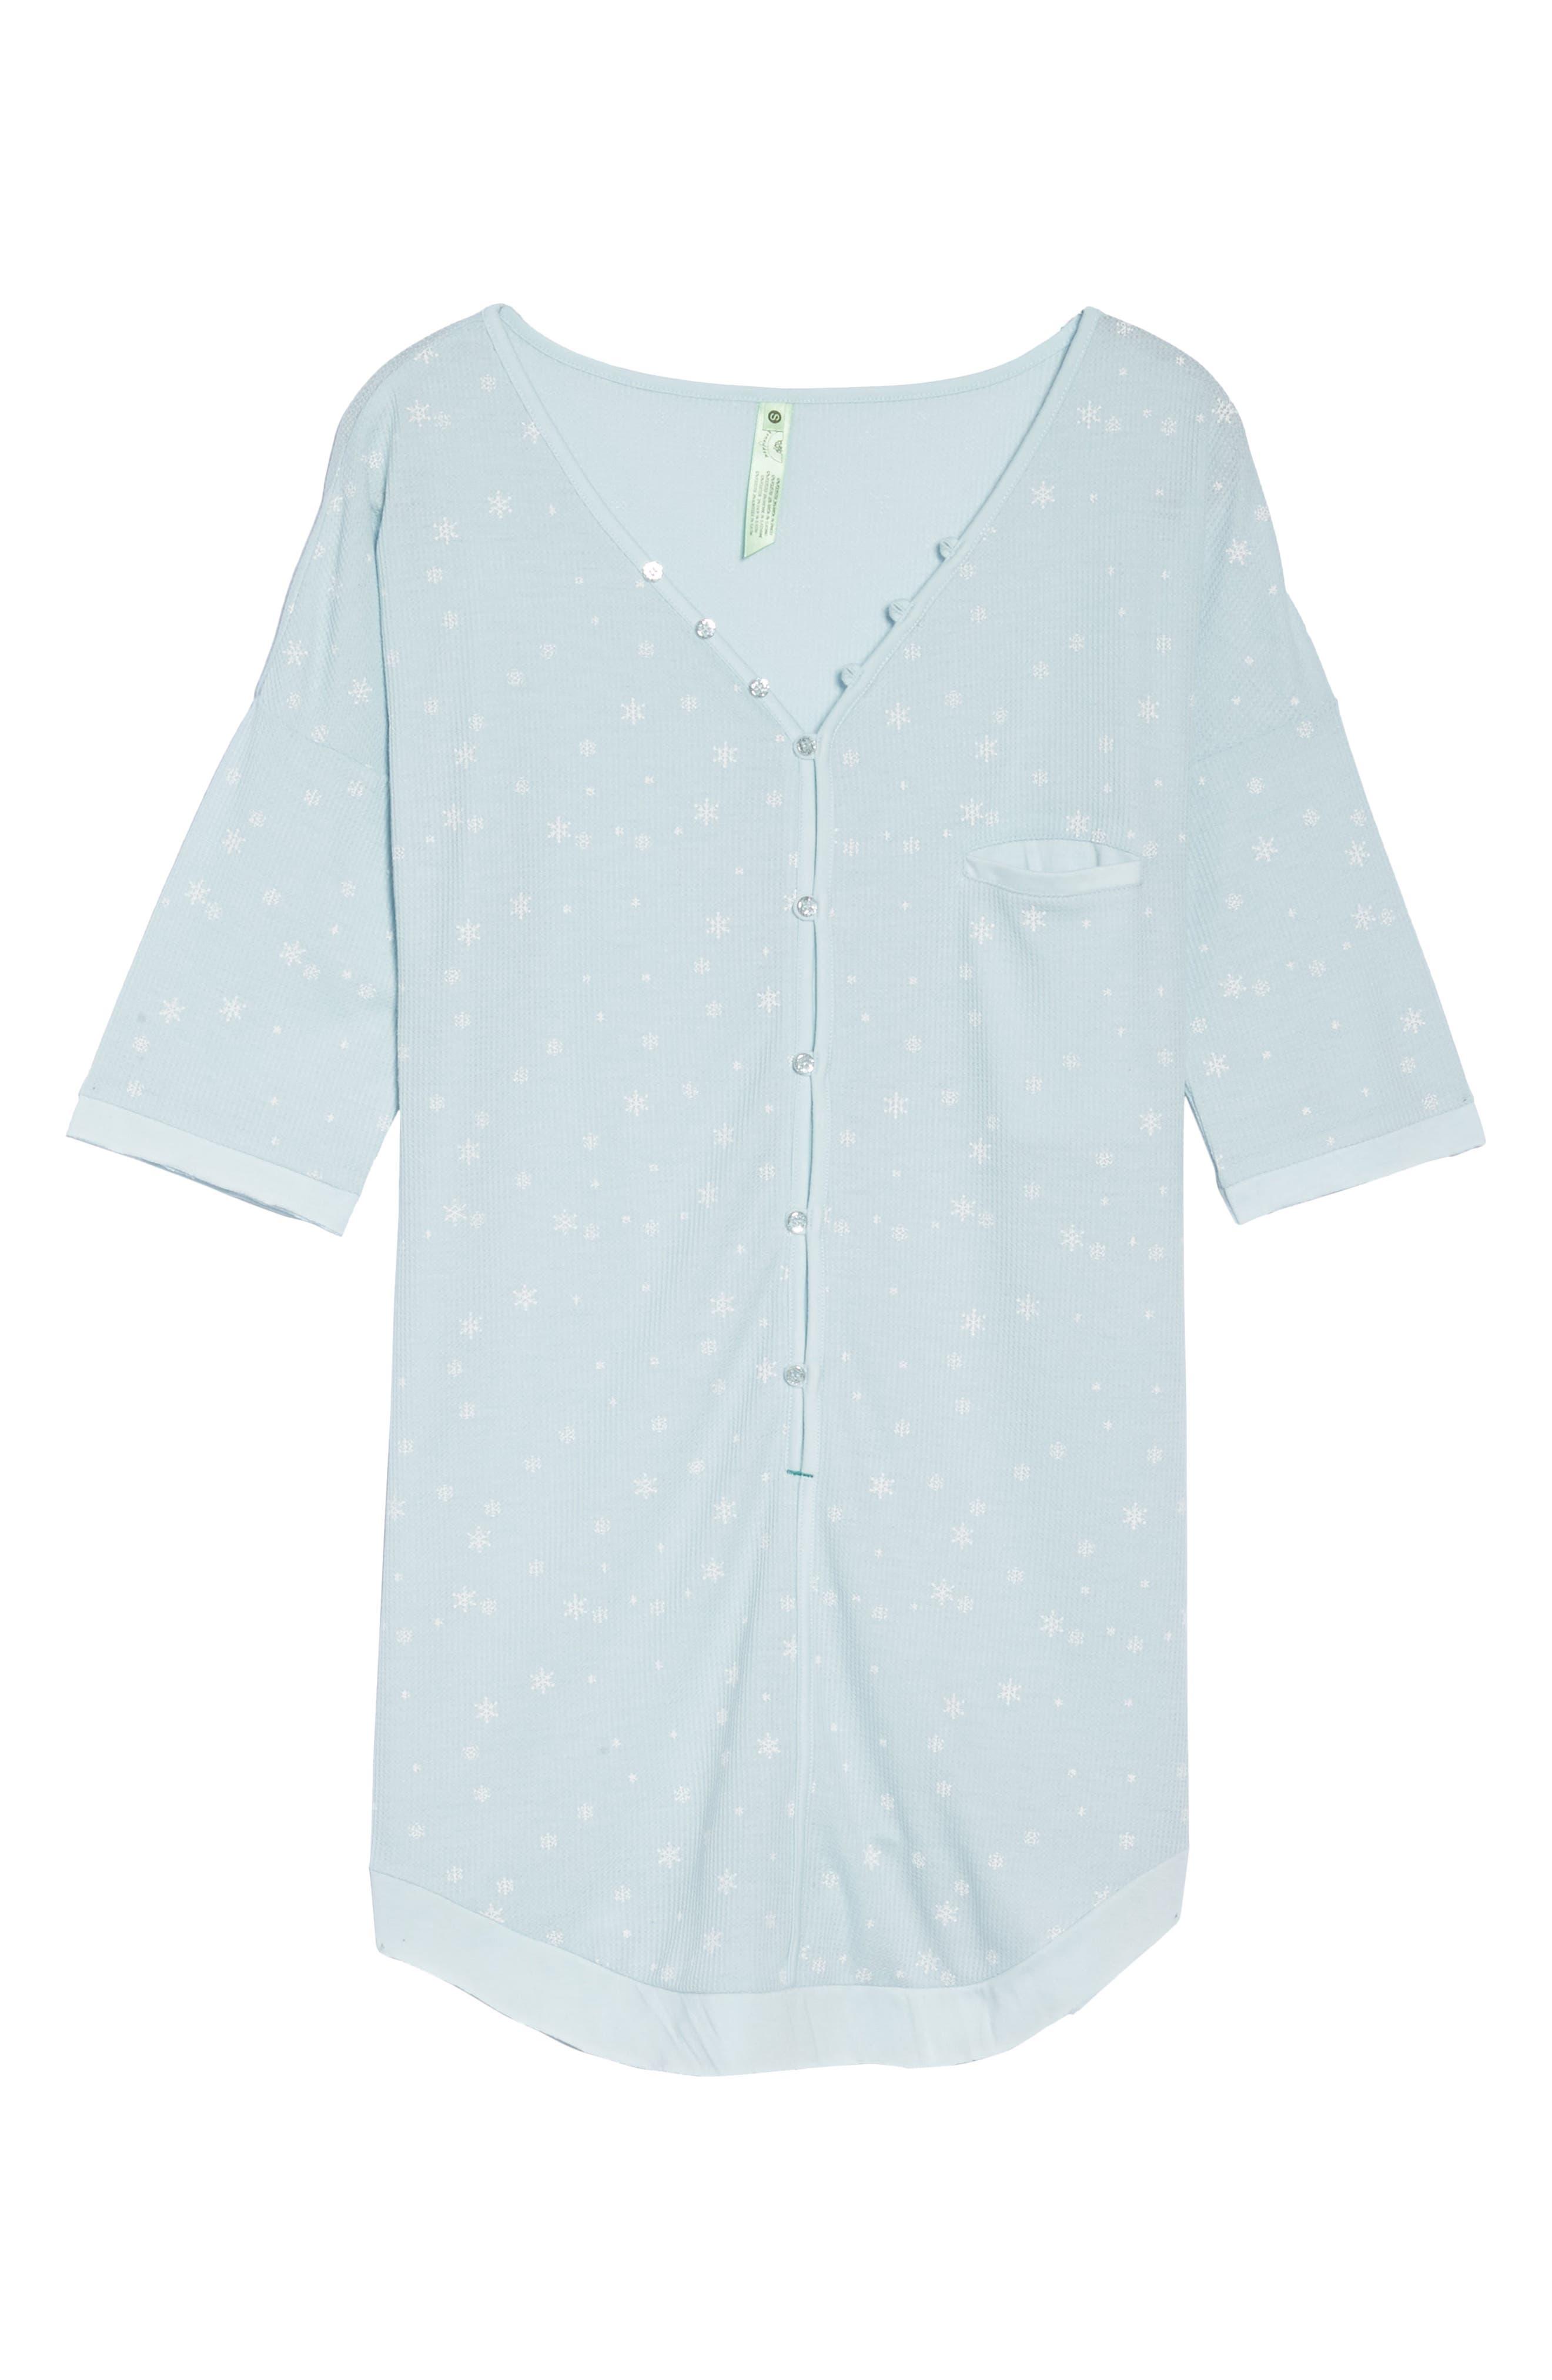 Sleep Shirt,                             Alternate thumbnail 22, color,